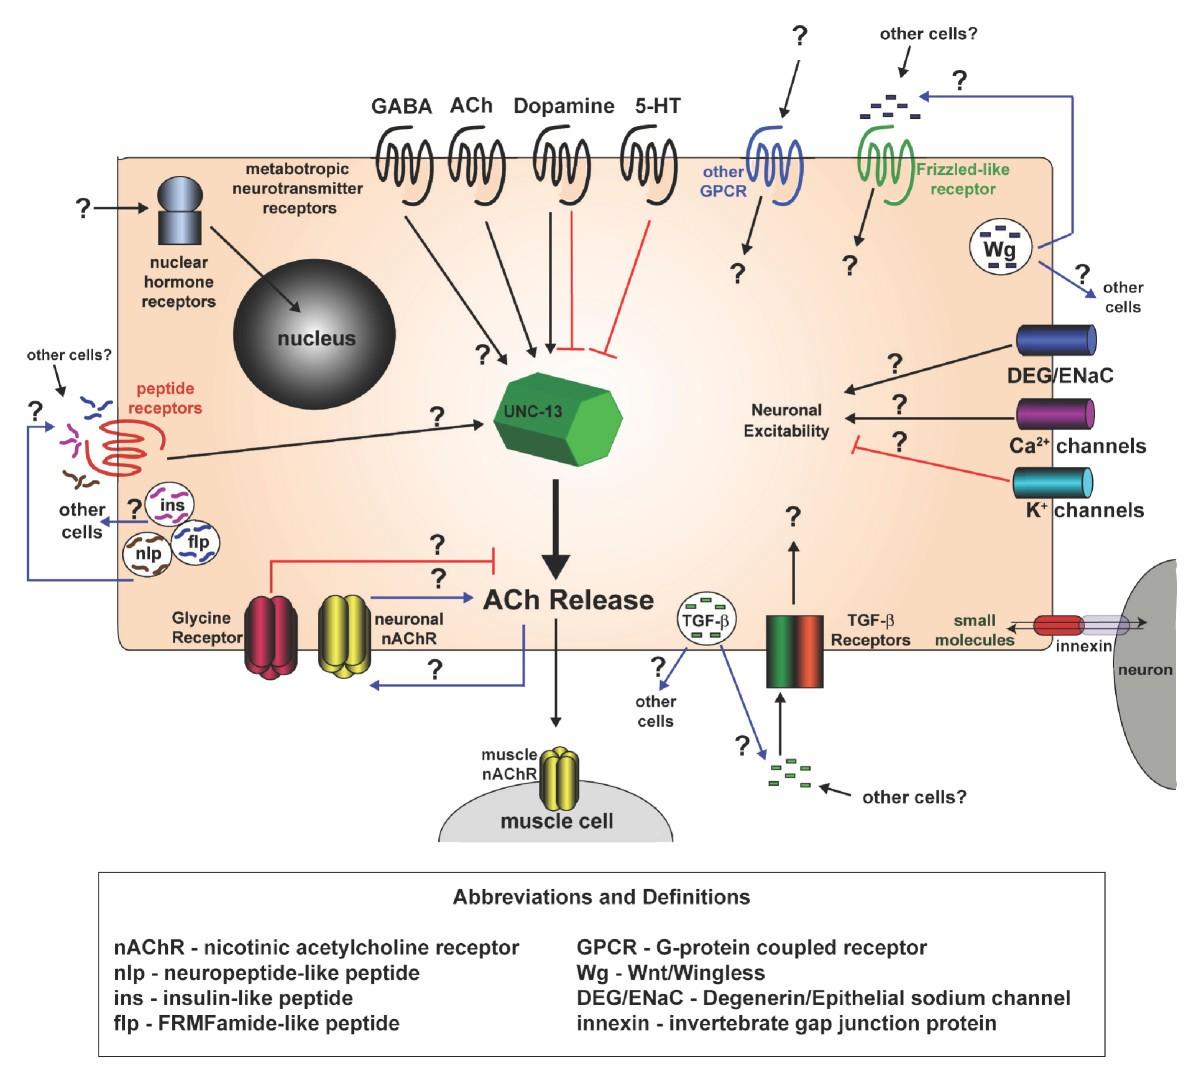 A Gene Expression Fingerprint Of C Elegans Embryonic Motor Neurons 302 188 Wiring Diagram Figure 8